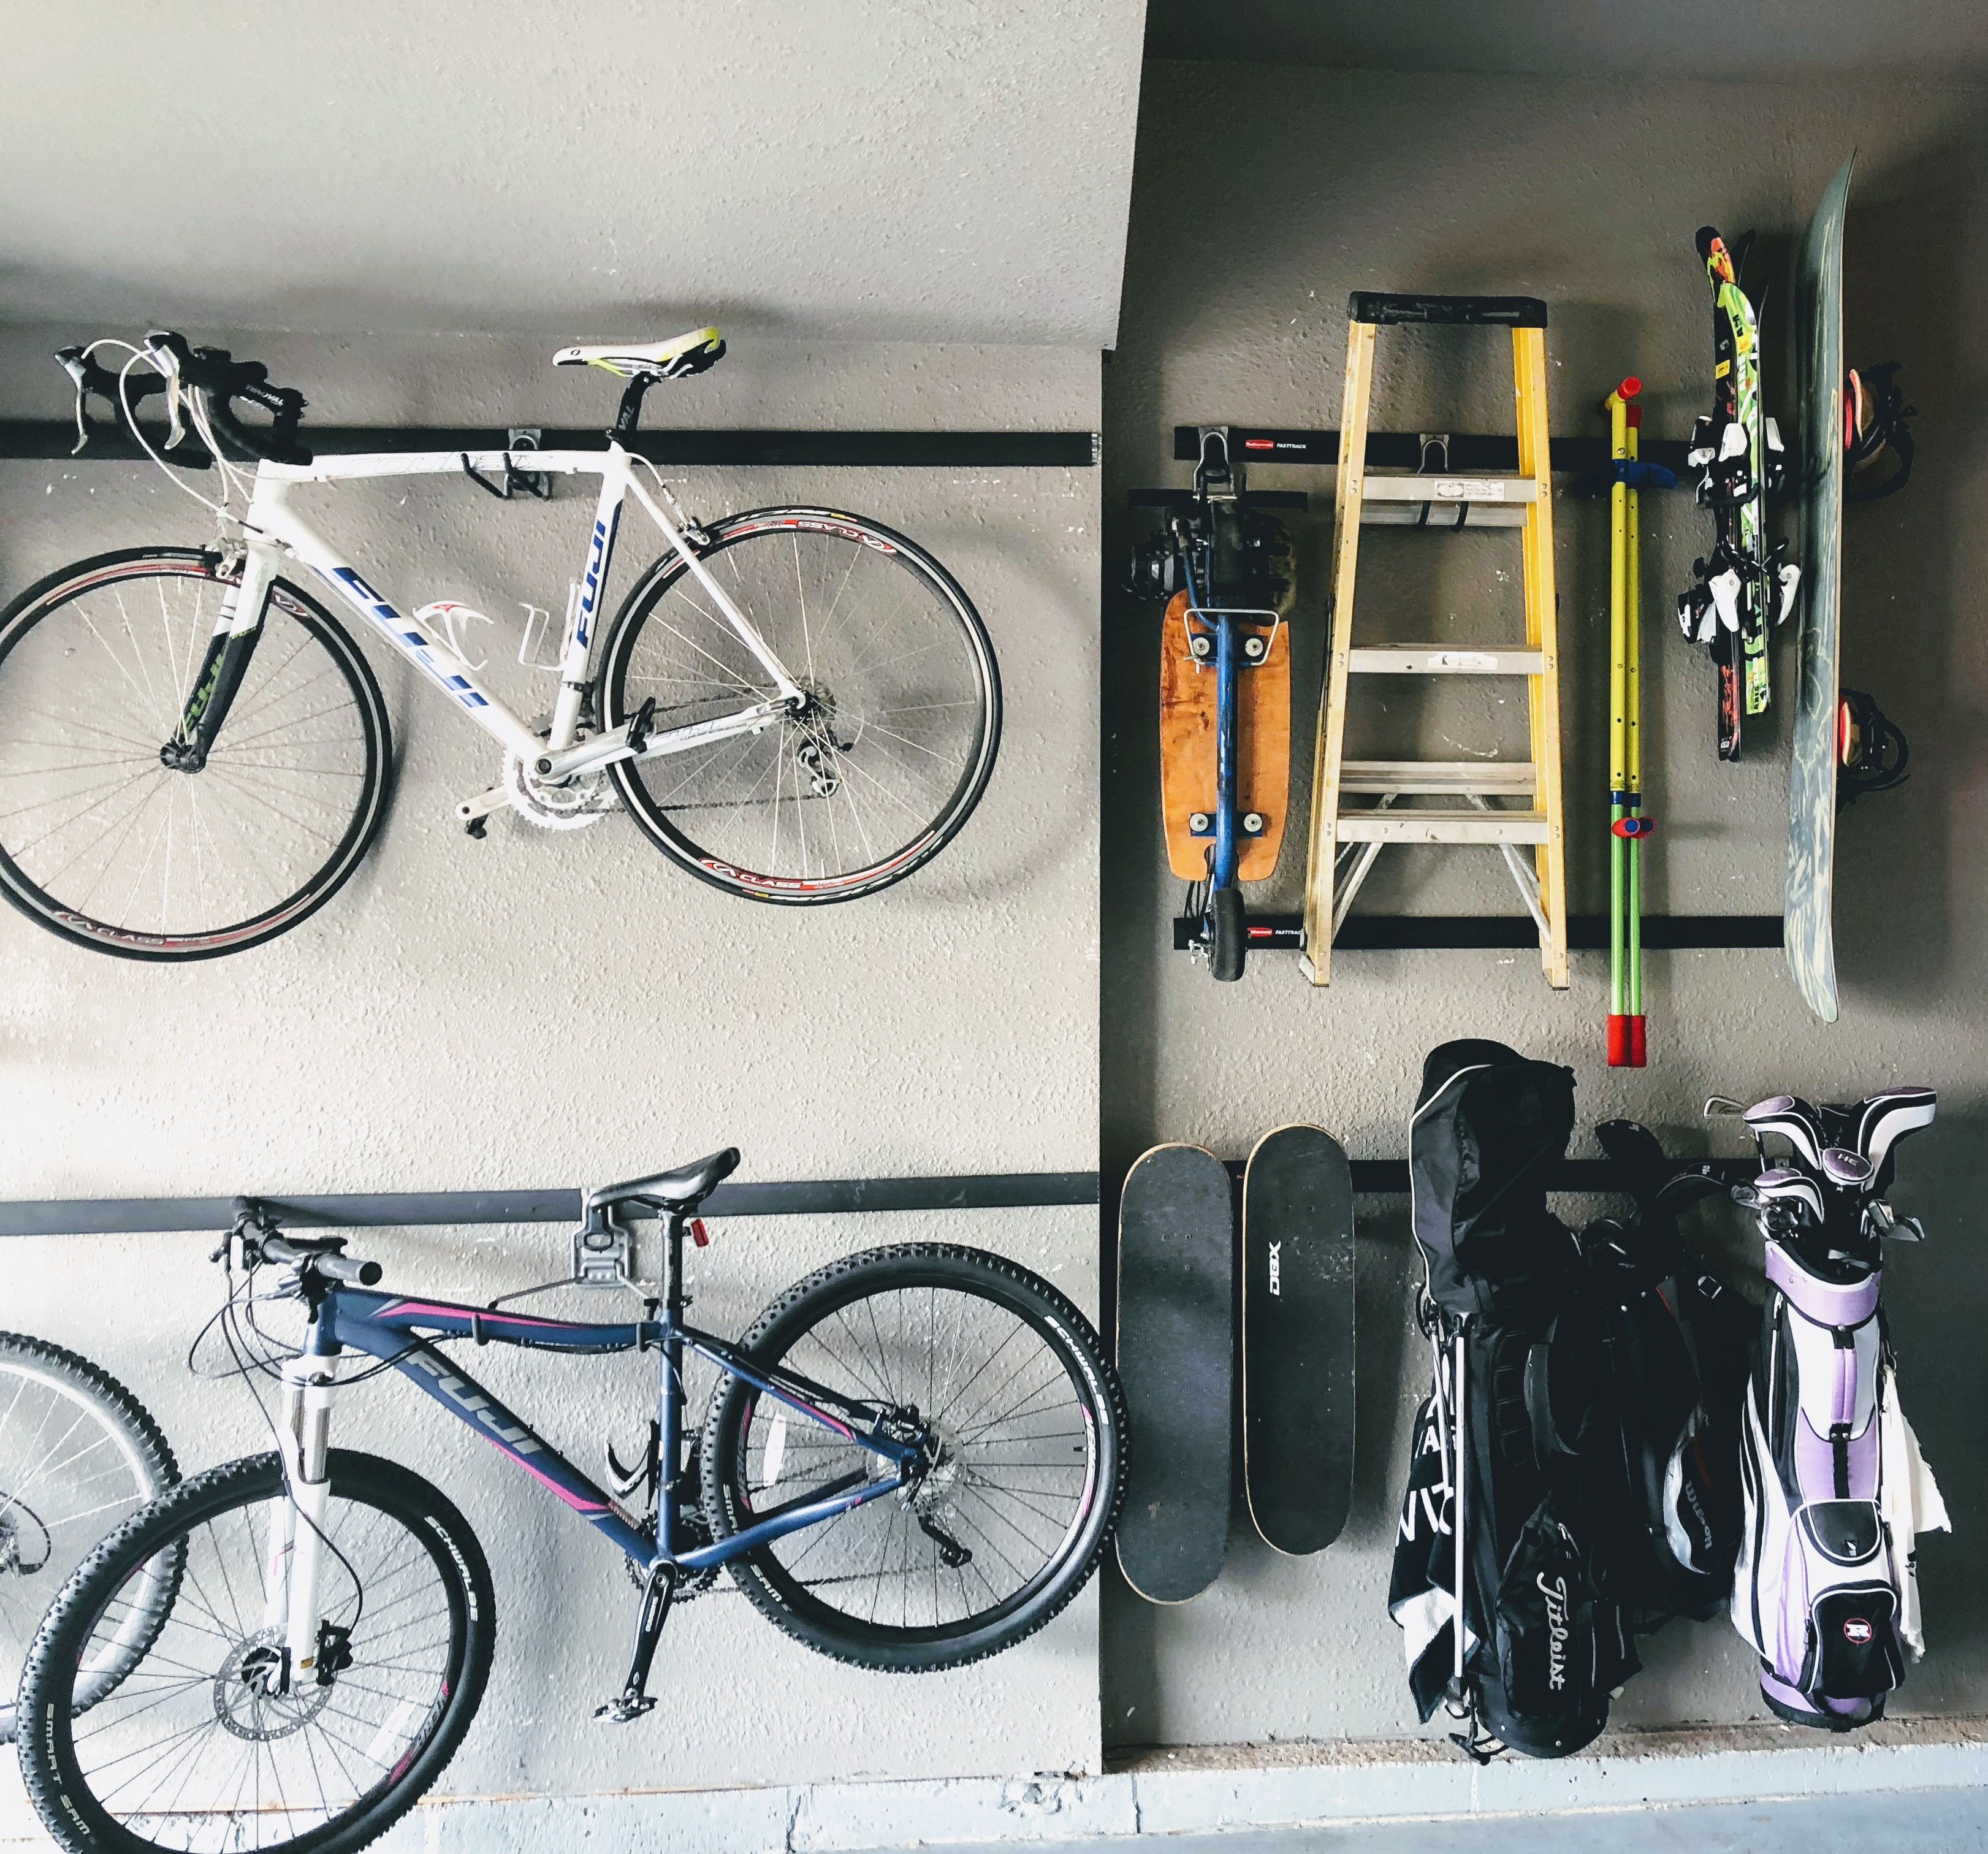 Garage Storage And Garage Organizing Hanging Bike Rack And Golf Bag Storage Off The Floor And R Home Organization Garage Storage Organization Hanging Bike Rack